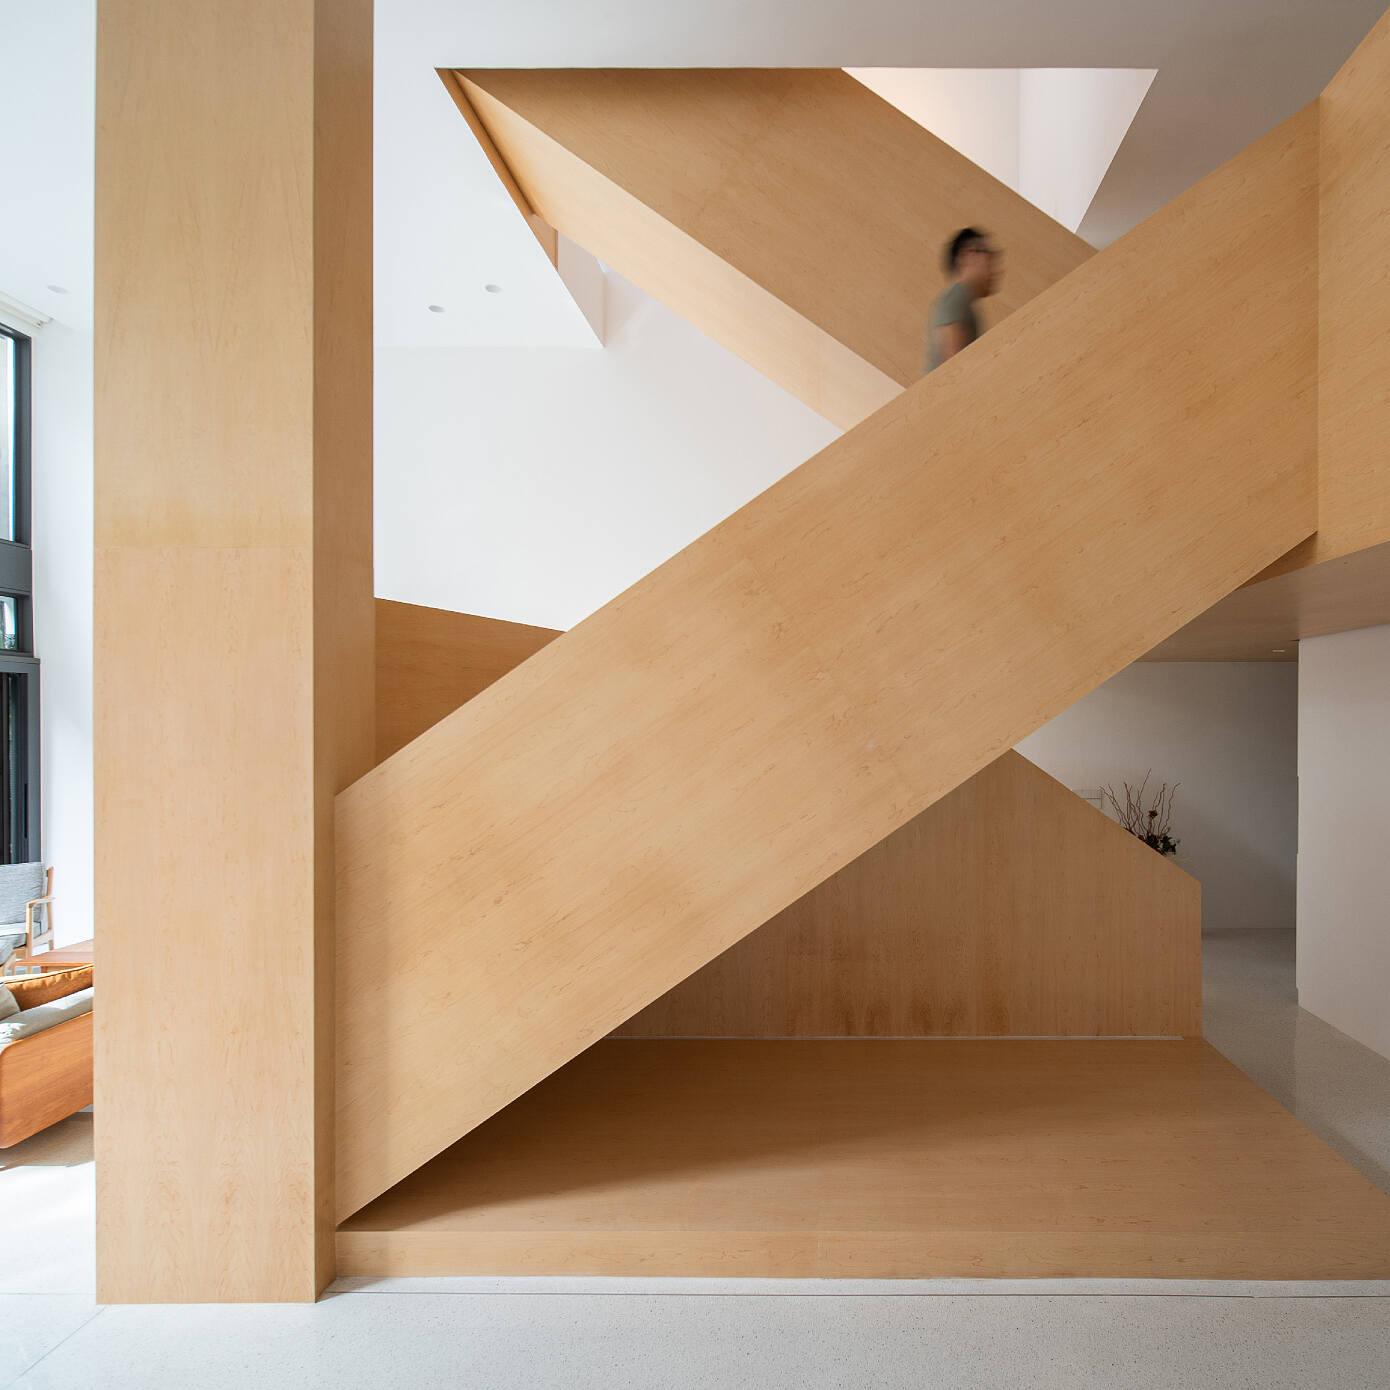 Makio House by Fabian Tan Architects